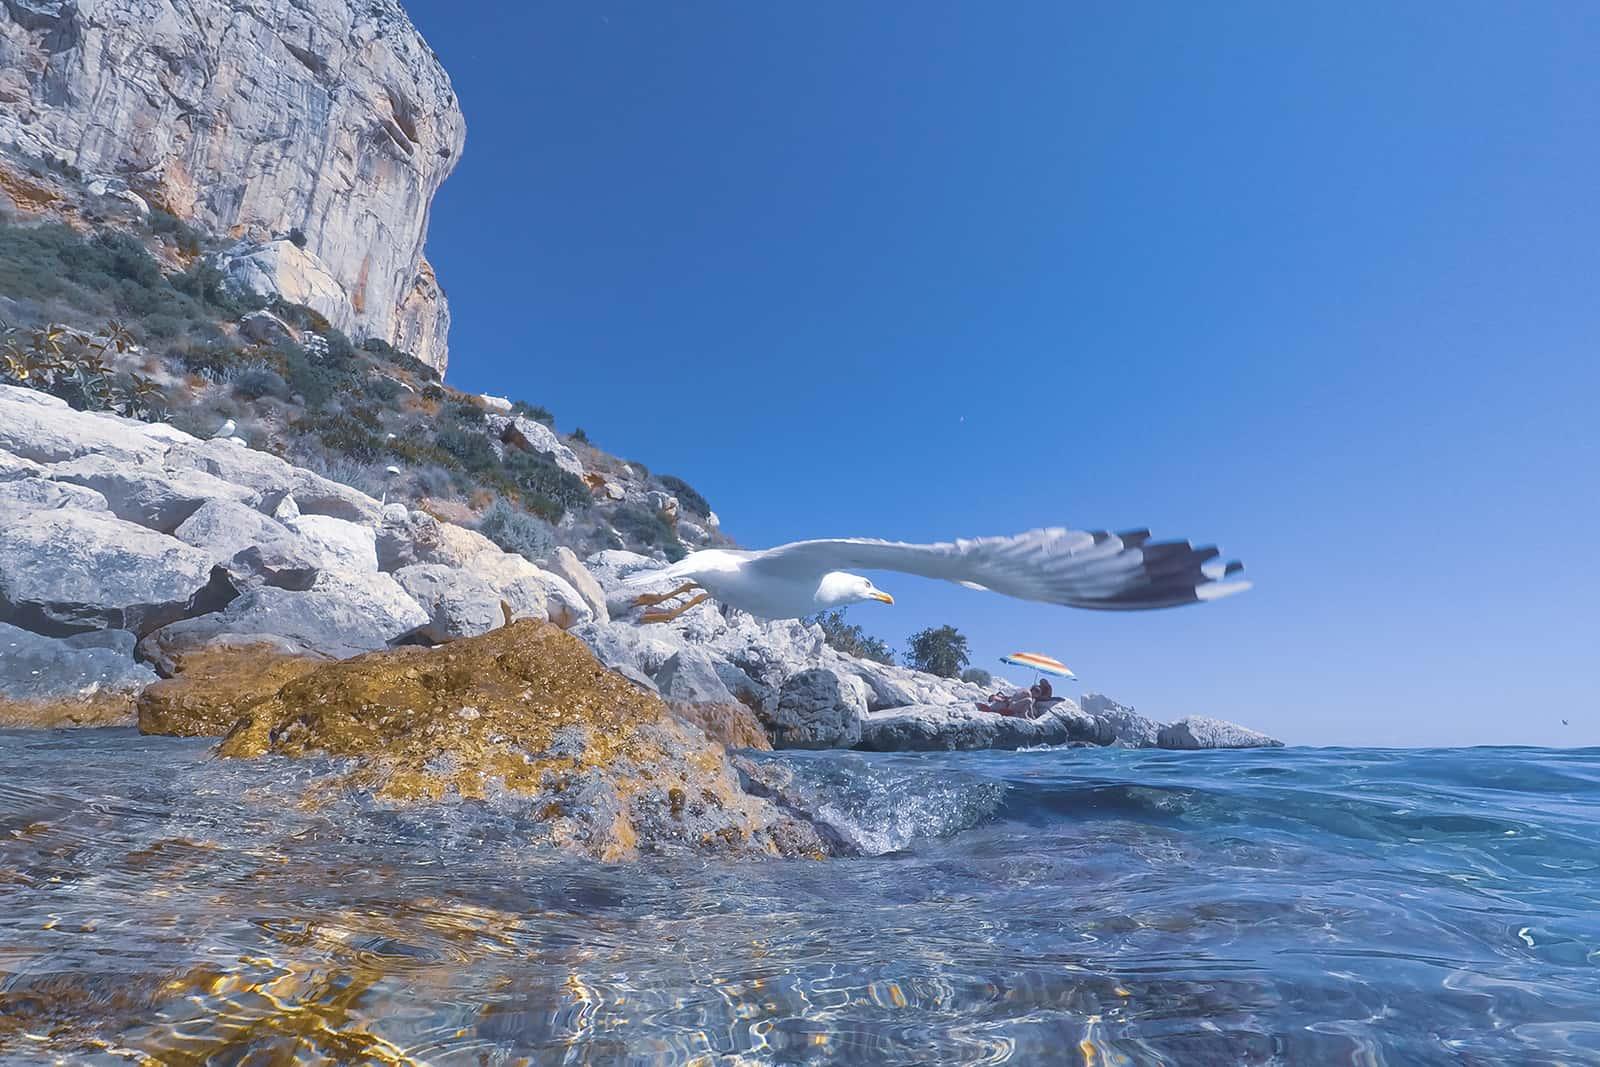 Underwater image Ifach rock in Calpe Alicante province Spain Mediterranean sea